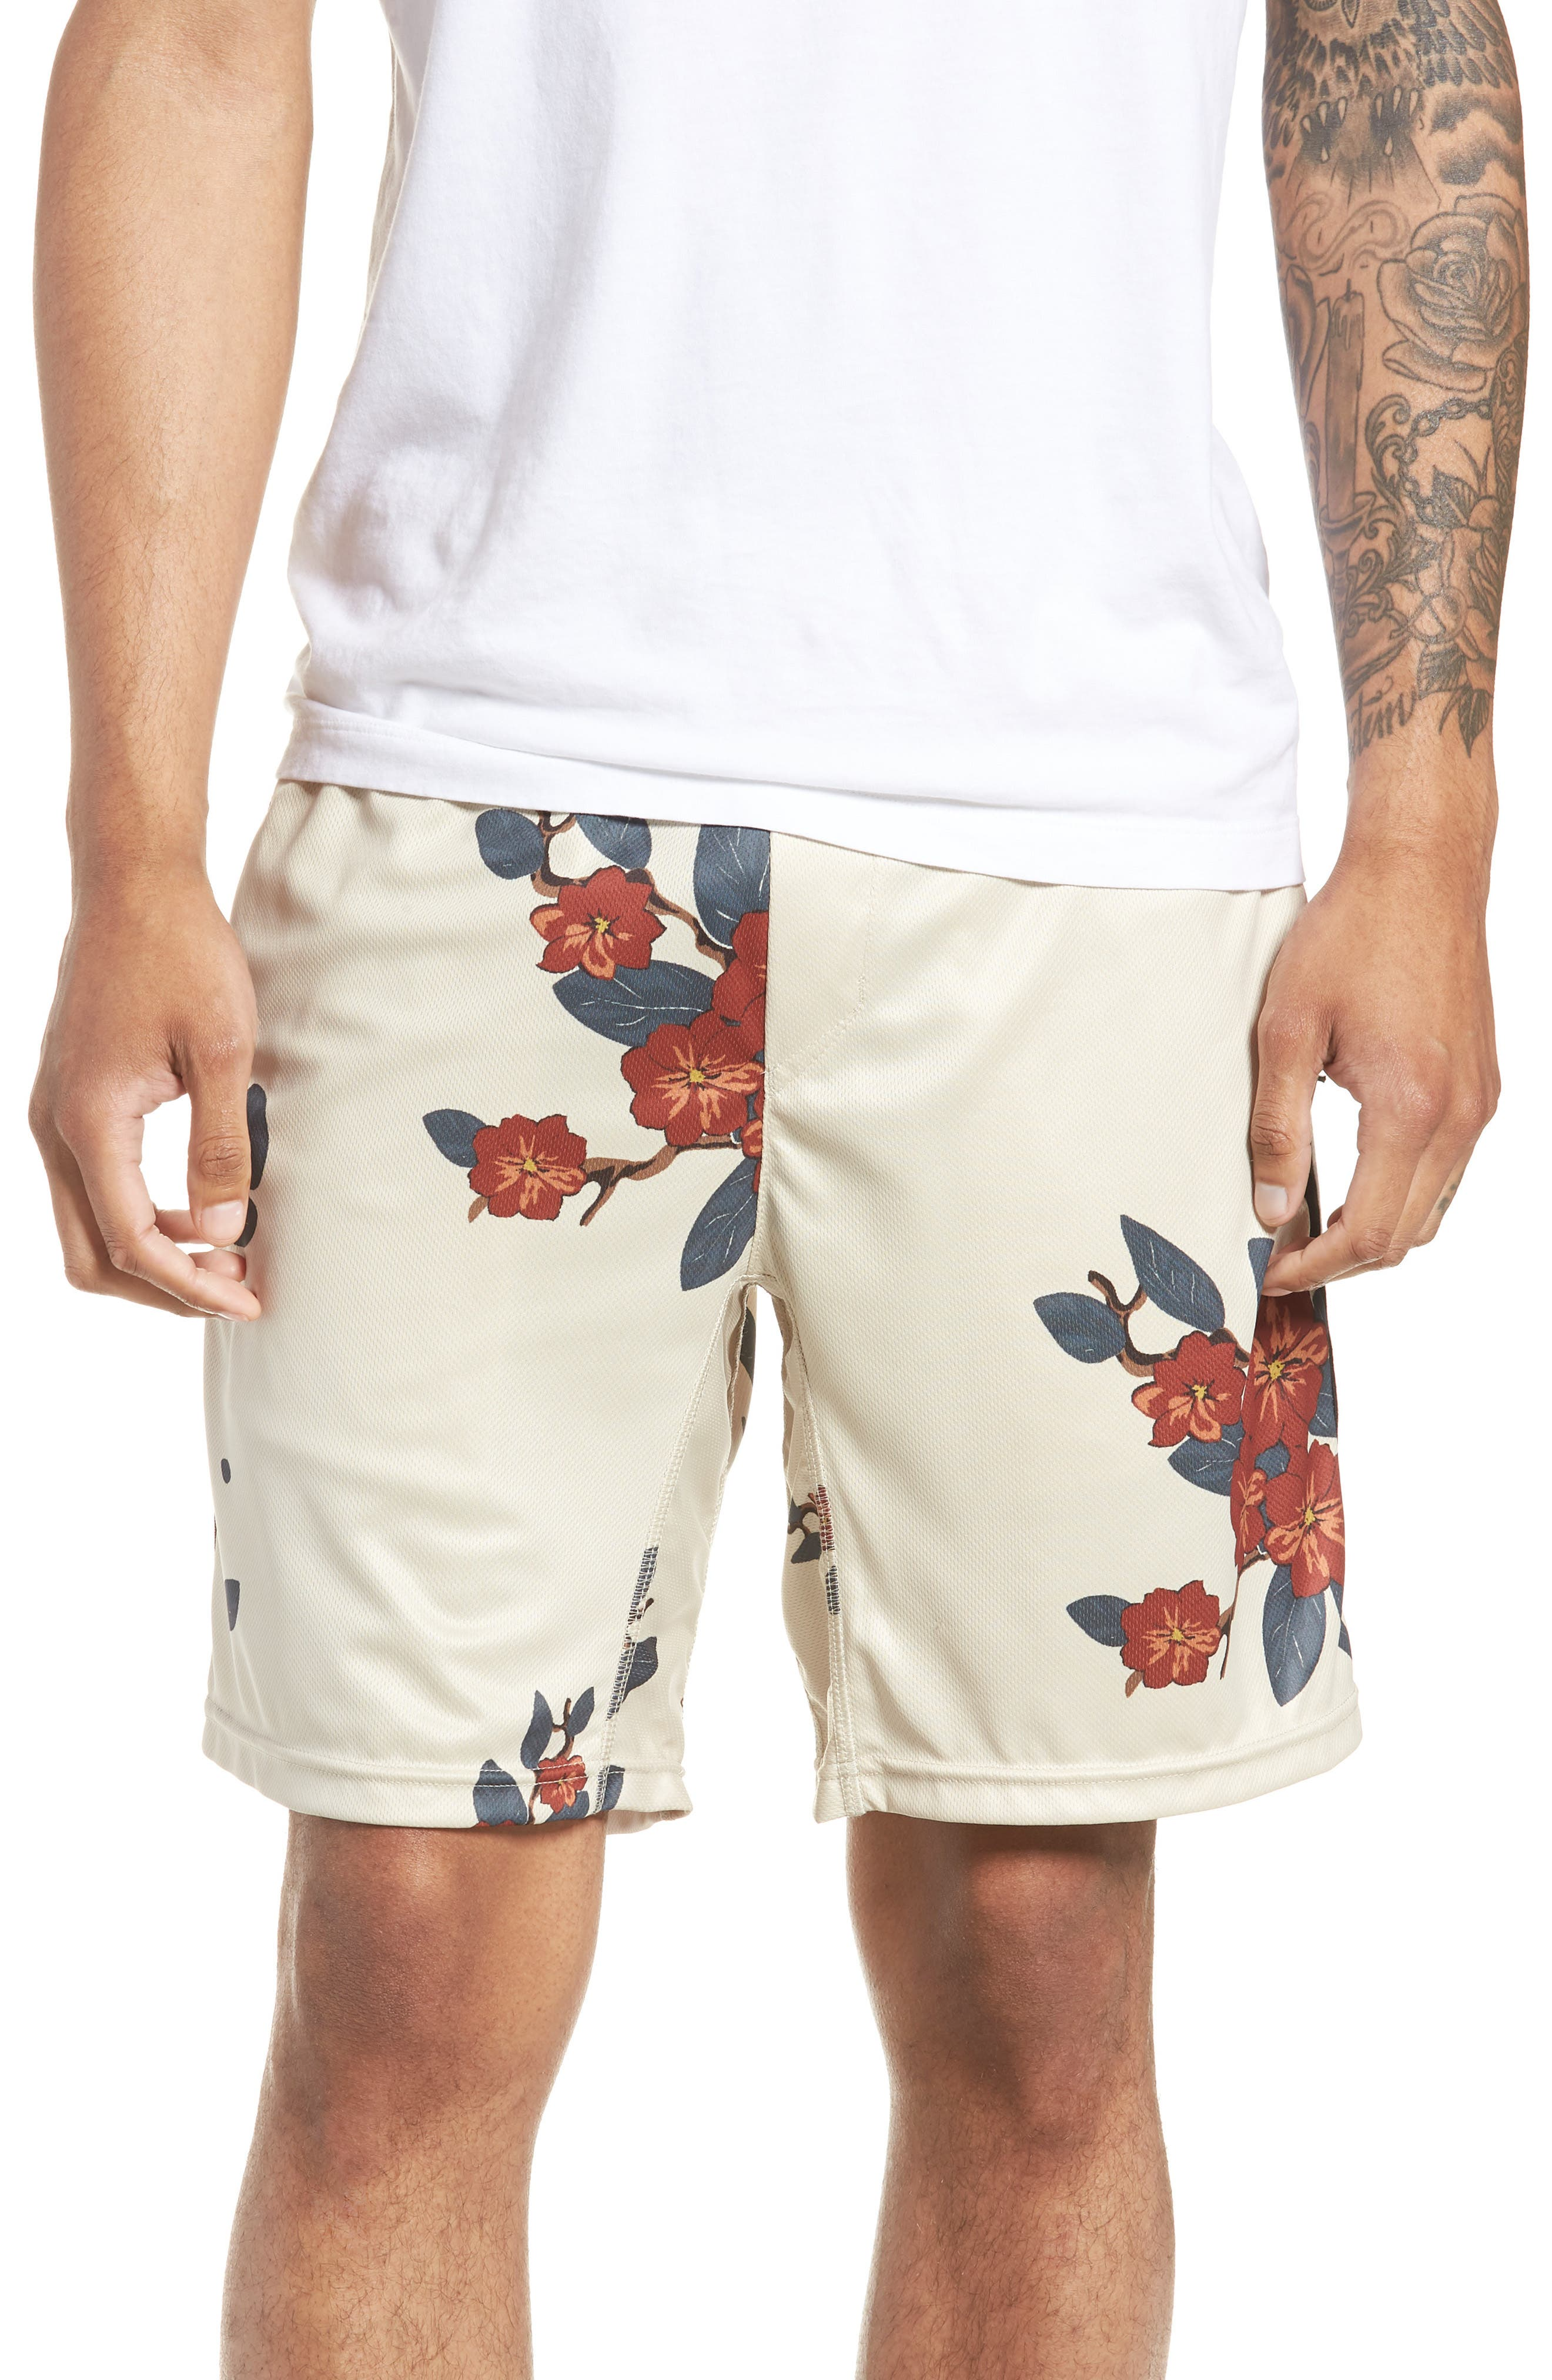 Bloom Sideline Shorts,                             Main thumbnail 1, color,                             901